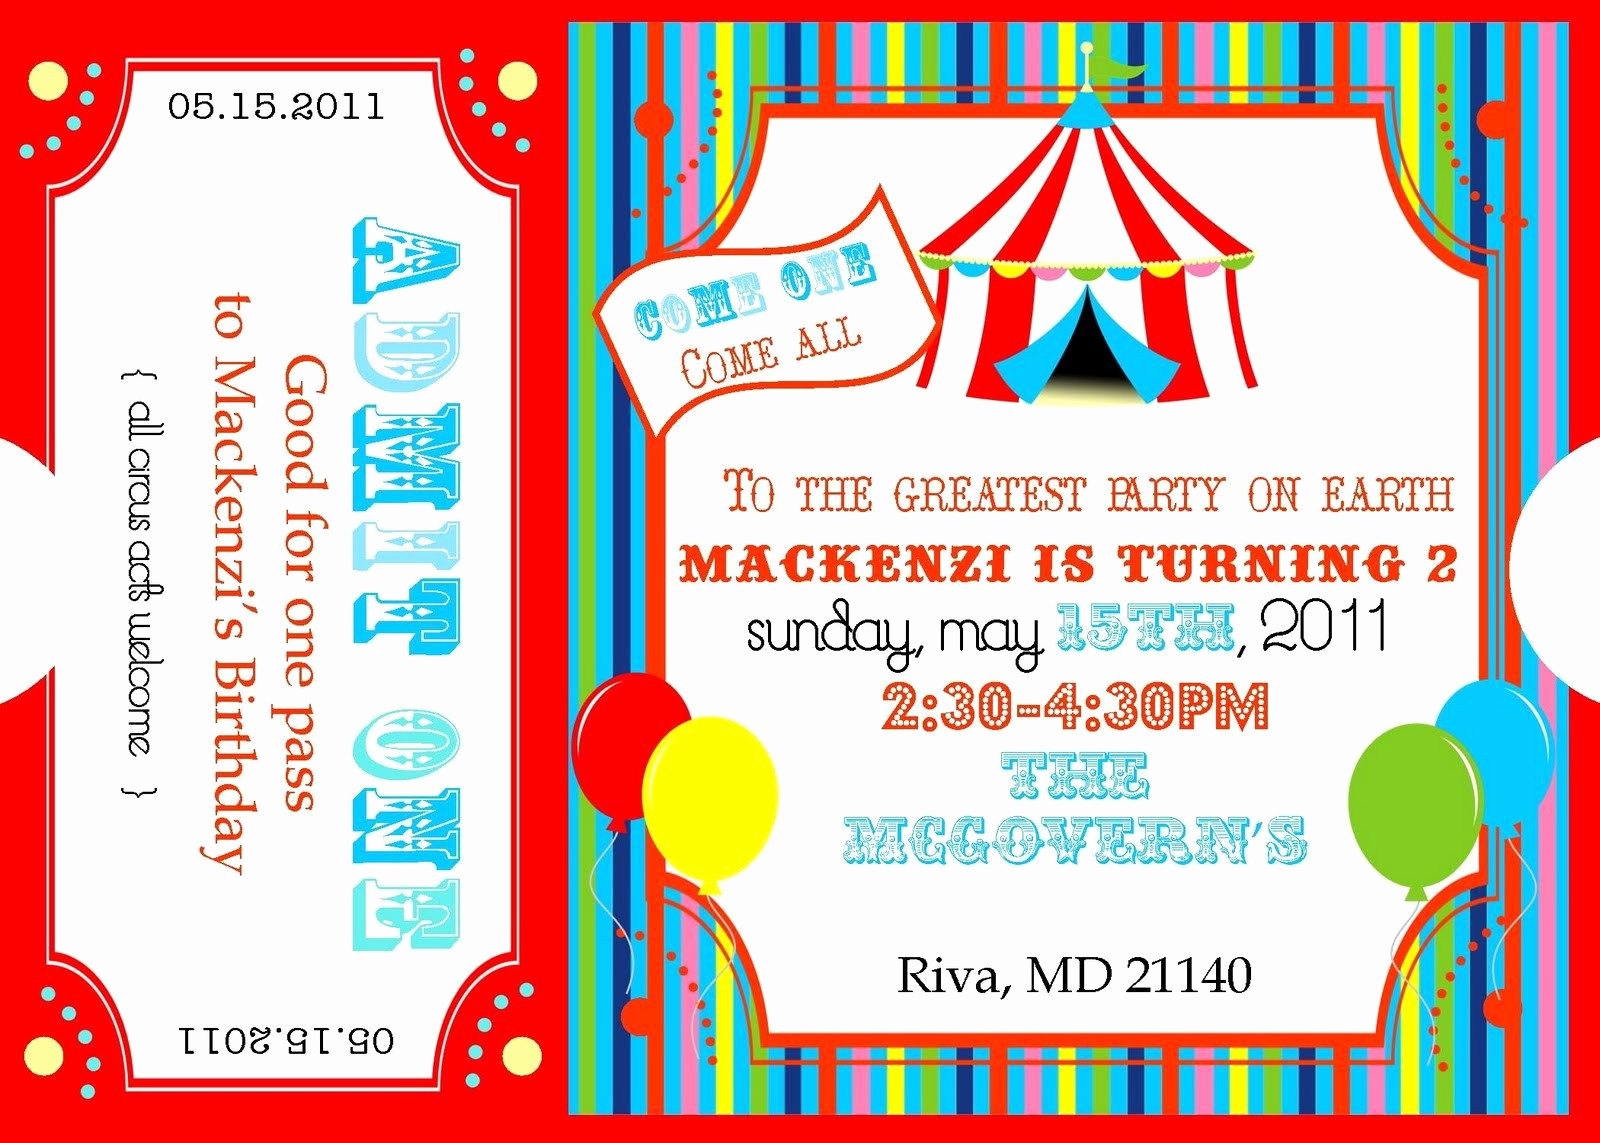 Carnival Ticket Invitation Template Elegant Free Printable Circus Invitation Templates Please forgive